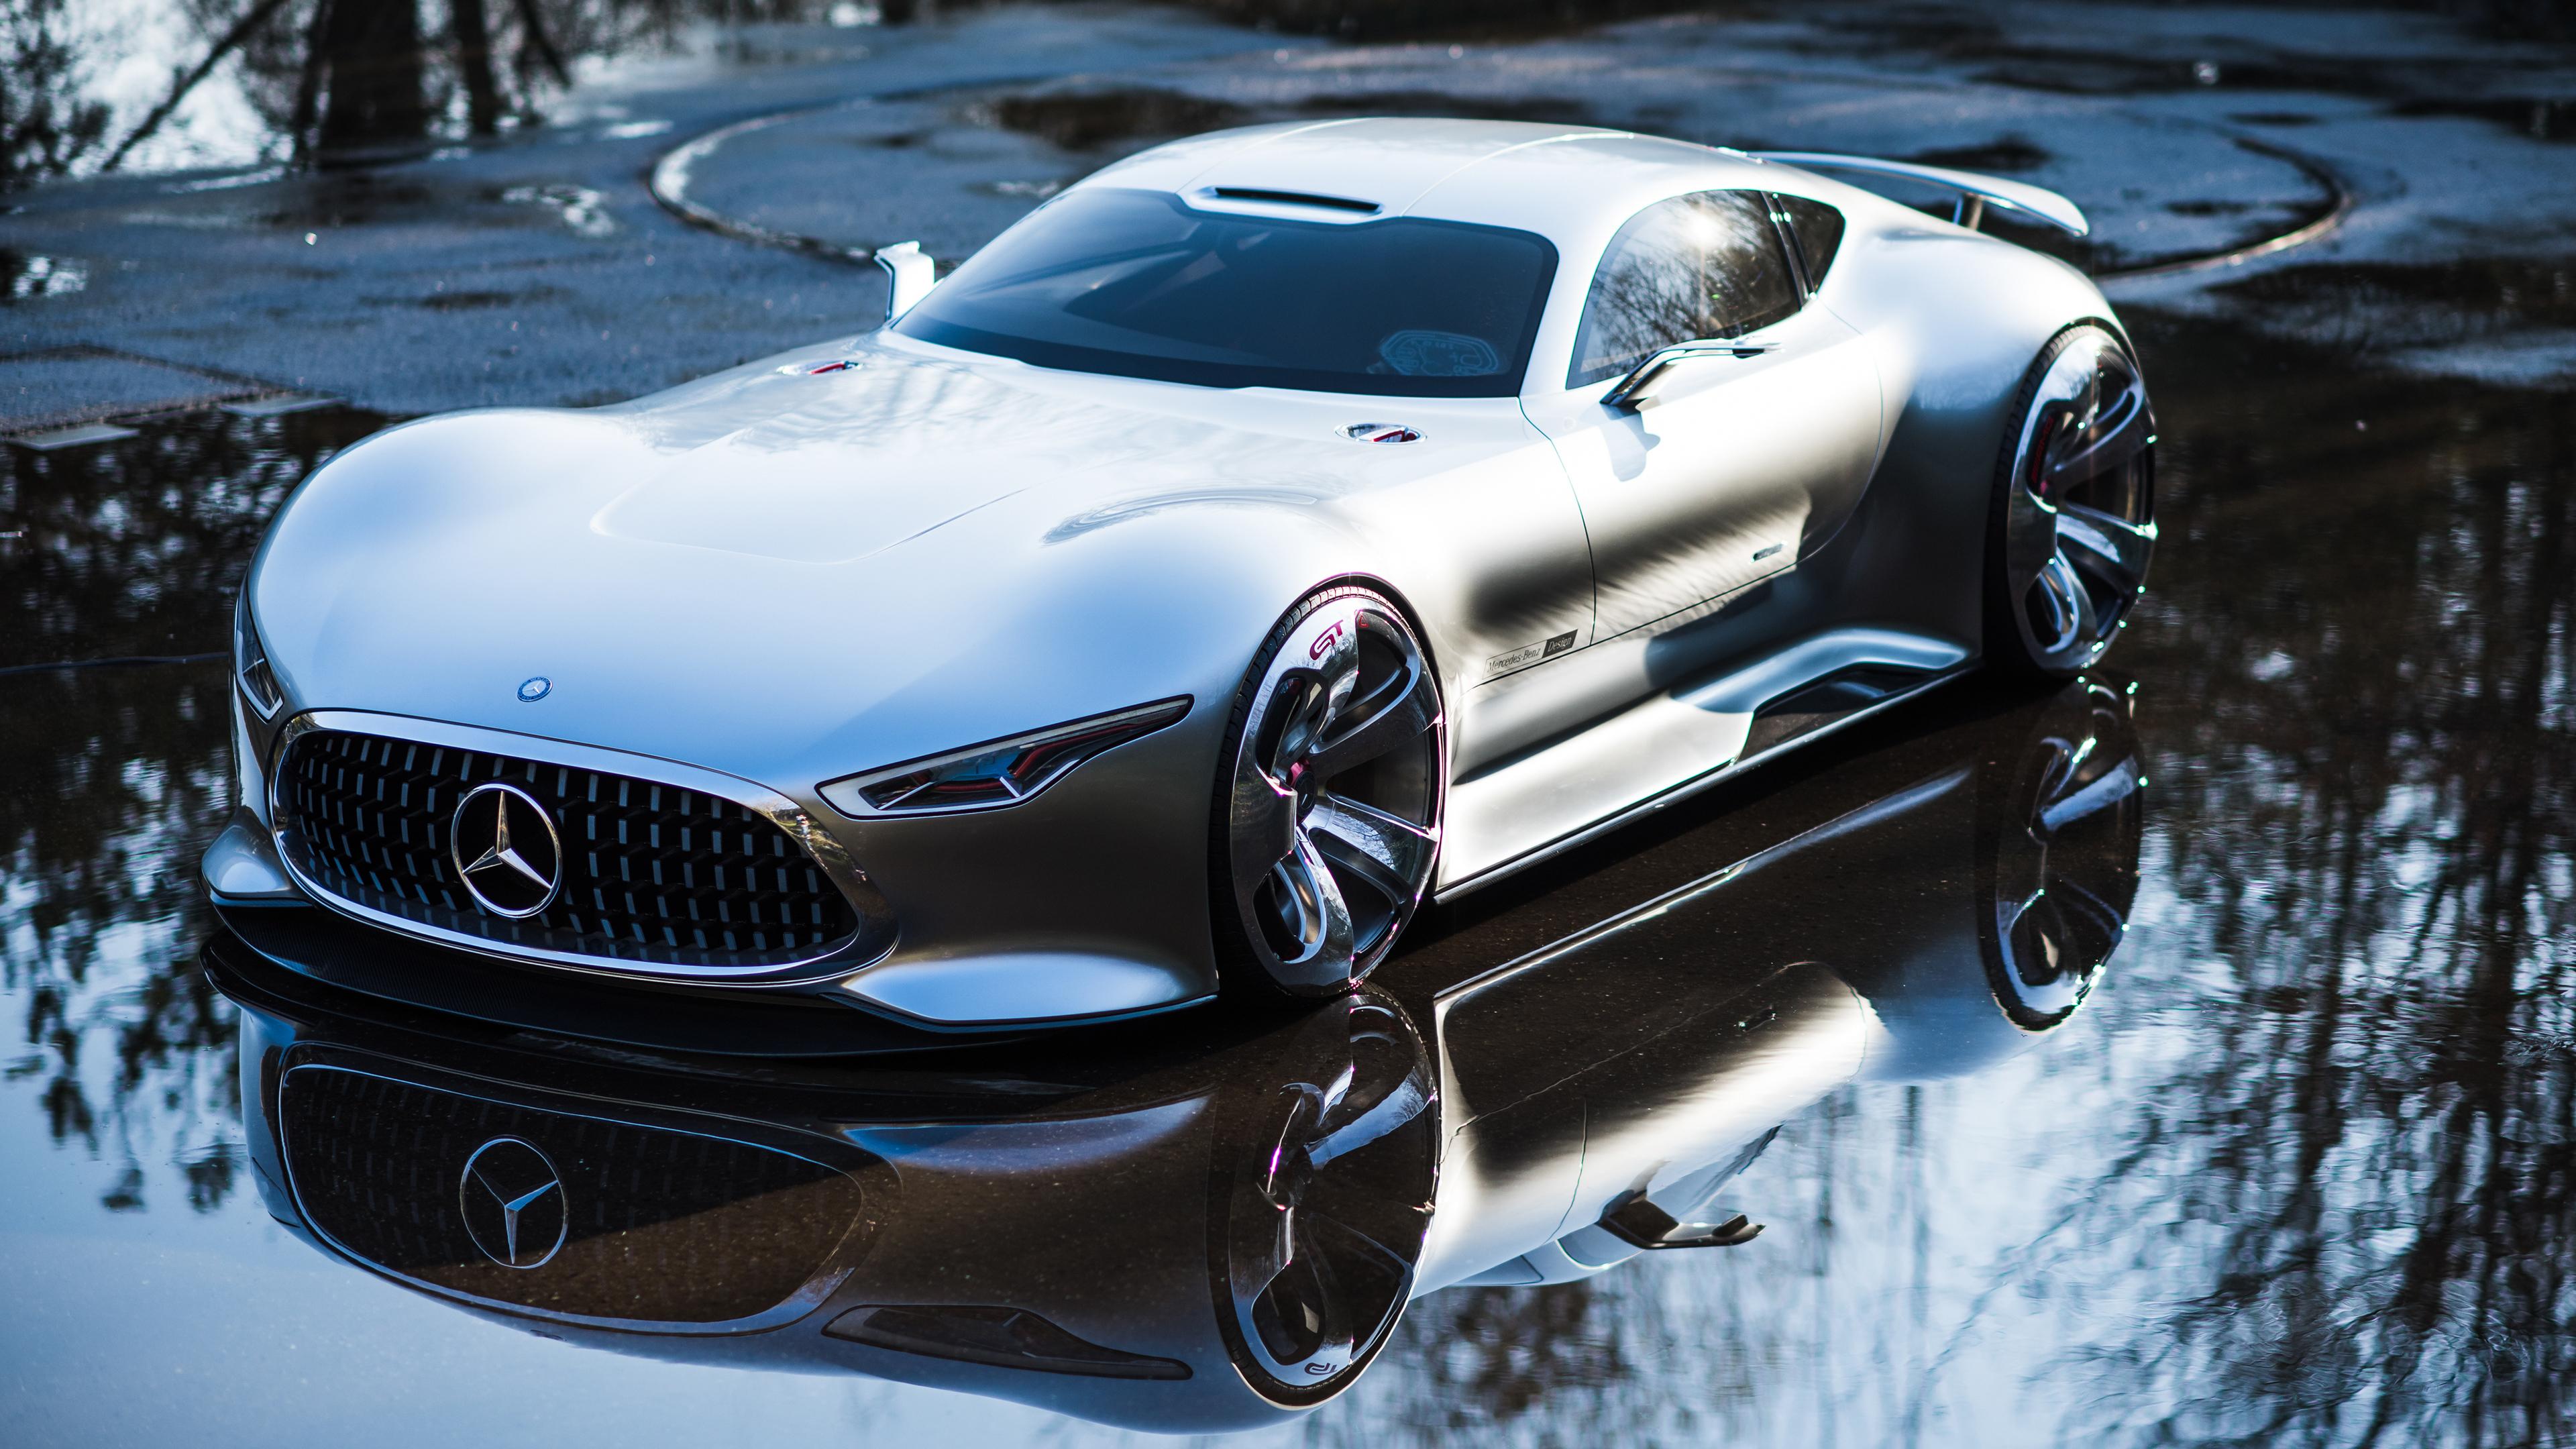 Mercedes Benz AMG Vision Gran Turismo 4k, HD Cars, 4k ...